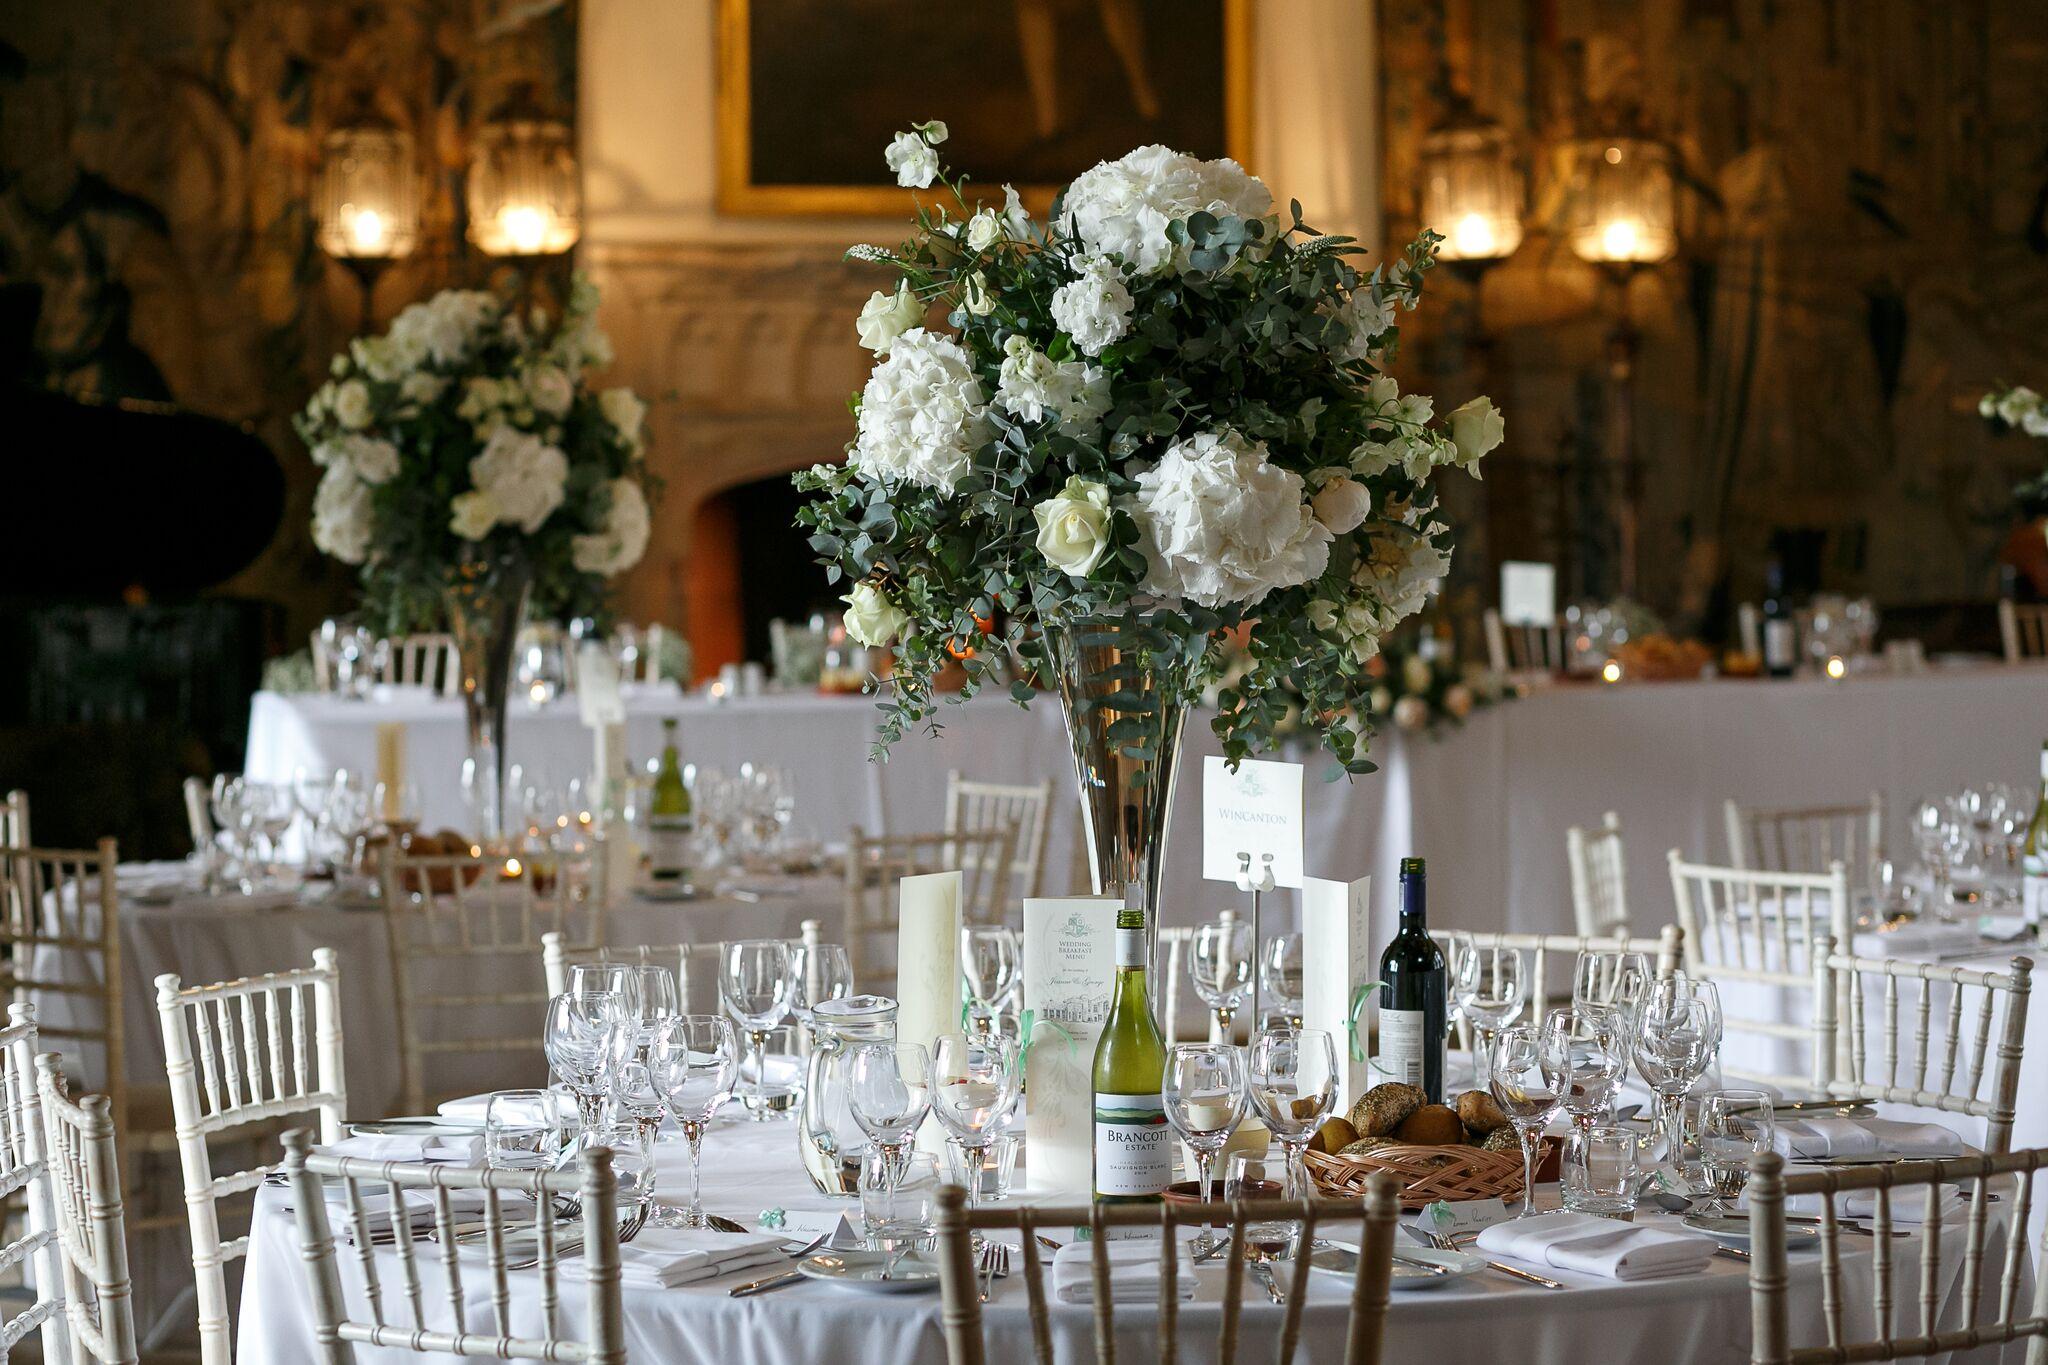 Large white hydrangeas wedding centrepieces